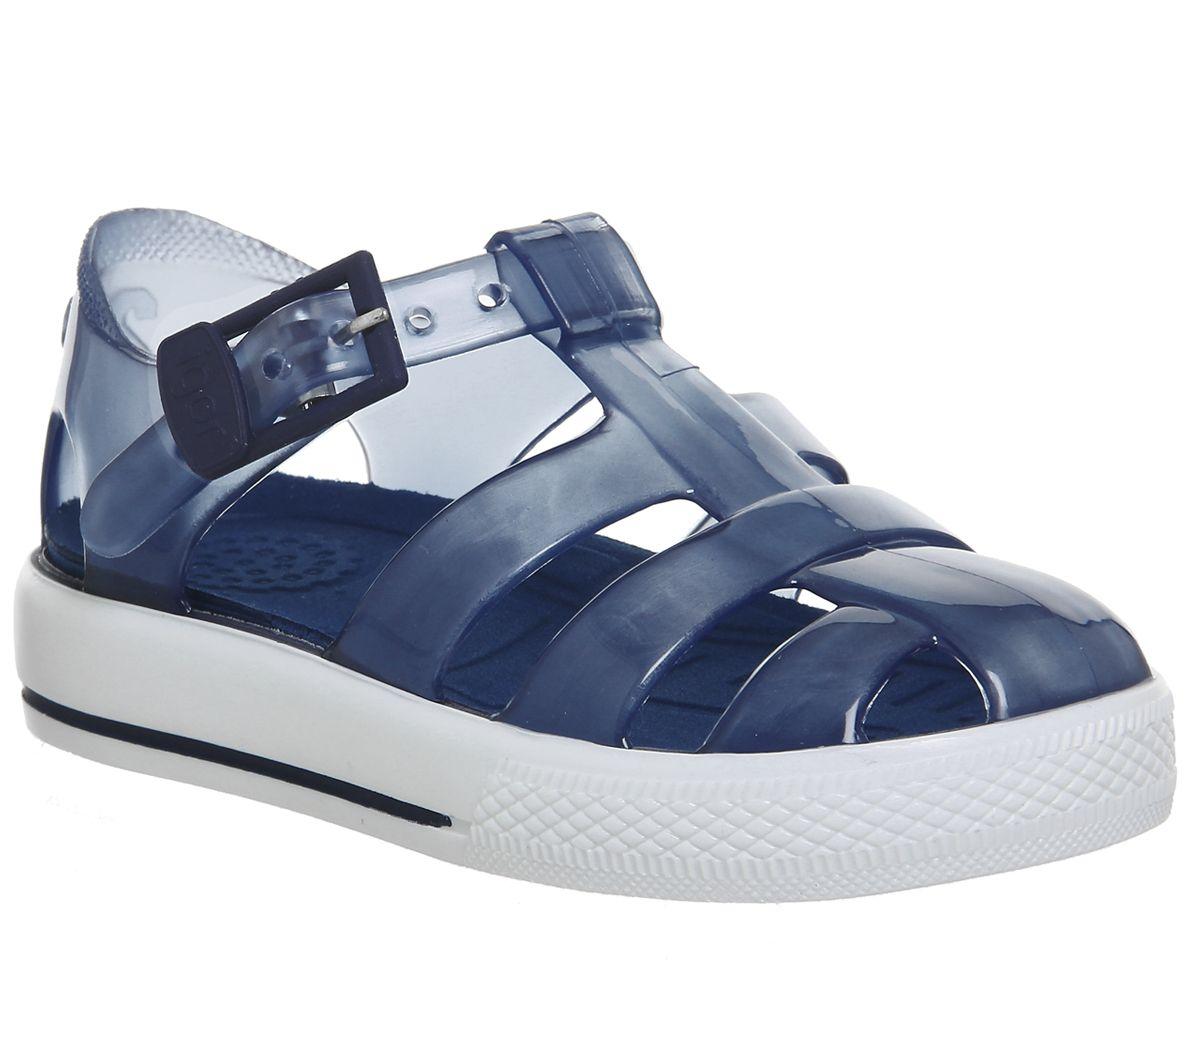 dd694815e71b Igor Tenis Kids Shoes Azul Blue - Unisex